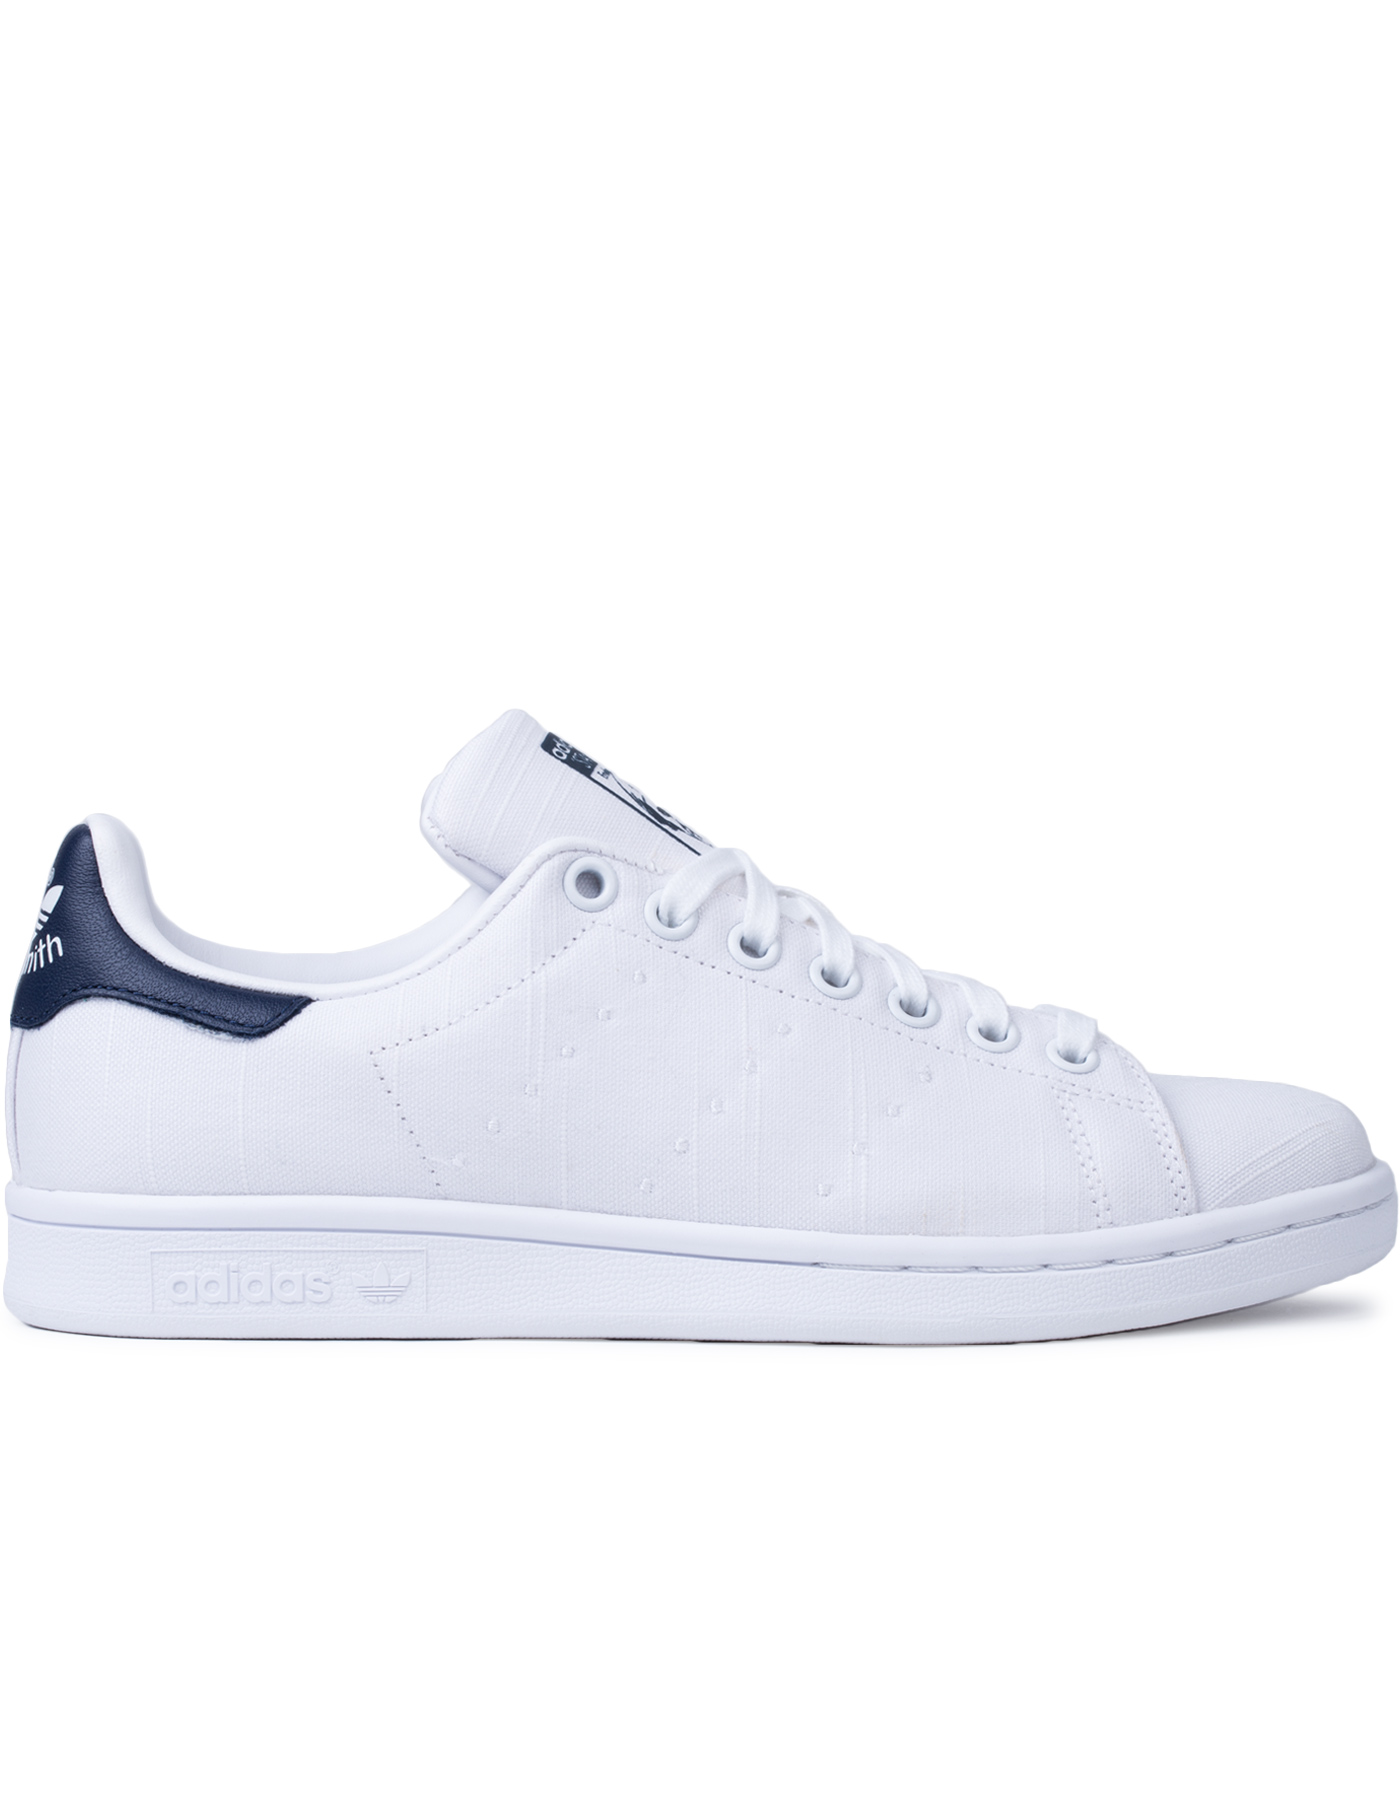 adidas originals canvas stan smith shoes hbx